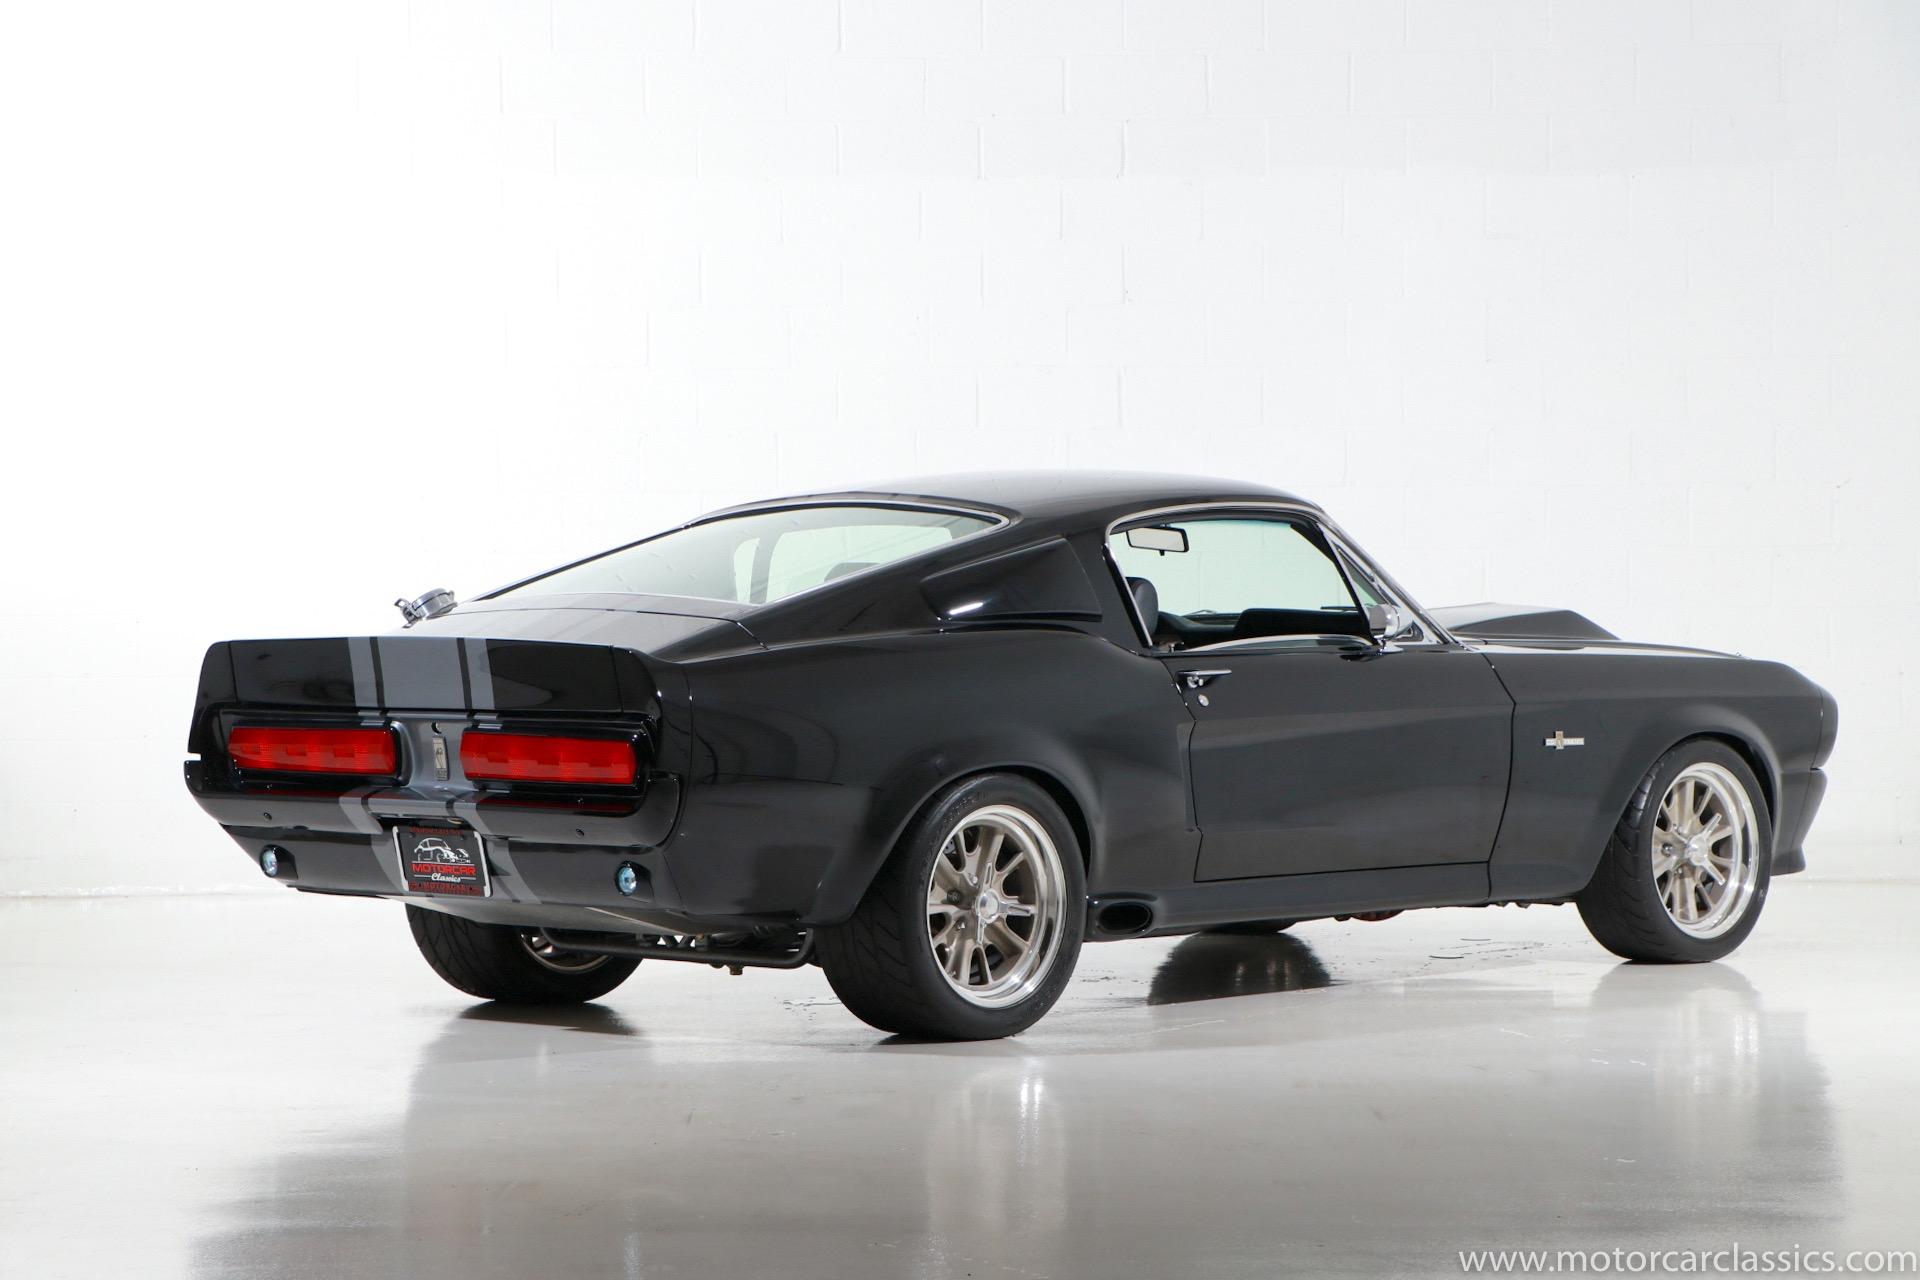 1967 Ford Shelby Mustang GT500E Super Snake